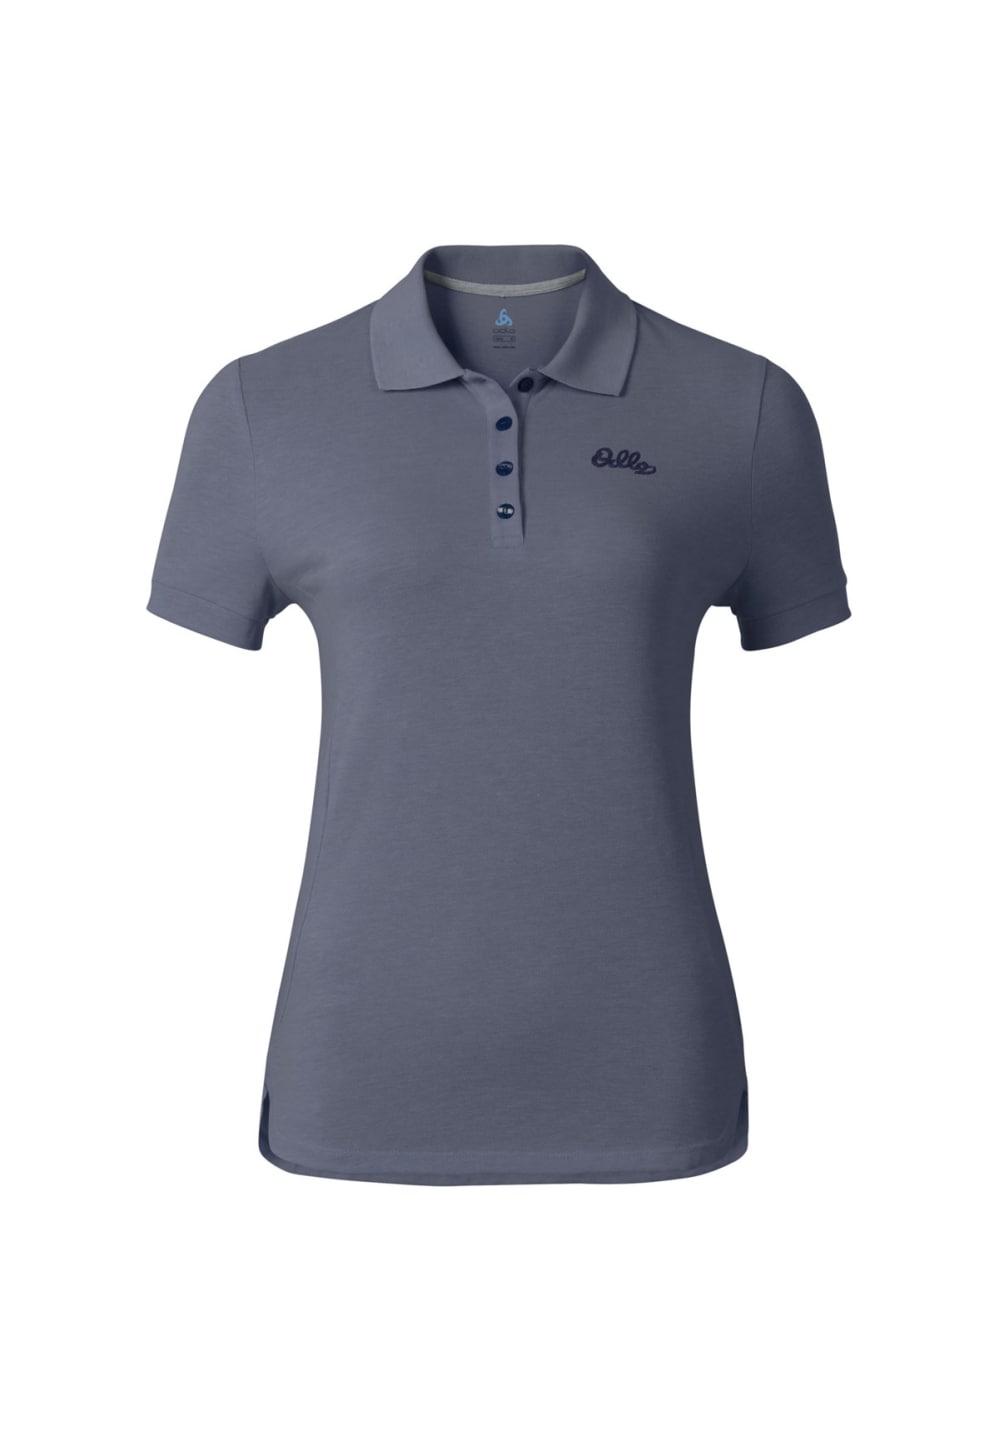 Odlo Polo Shirt Short Sleeve Trim - Laufshirts für Damen - Grau, Gr. S